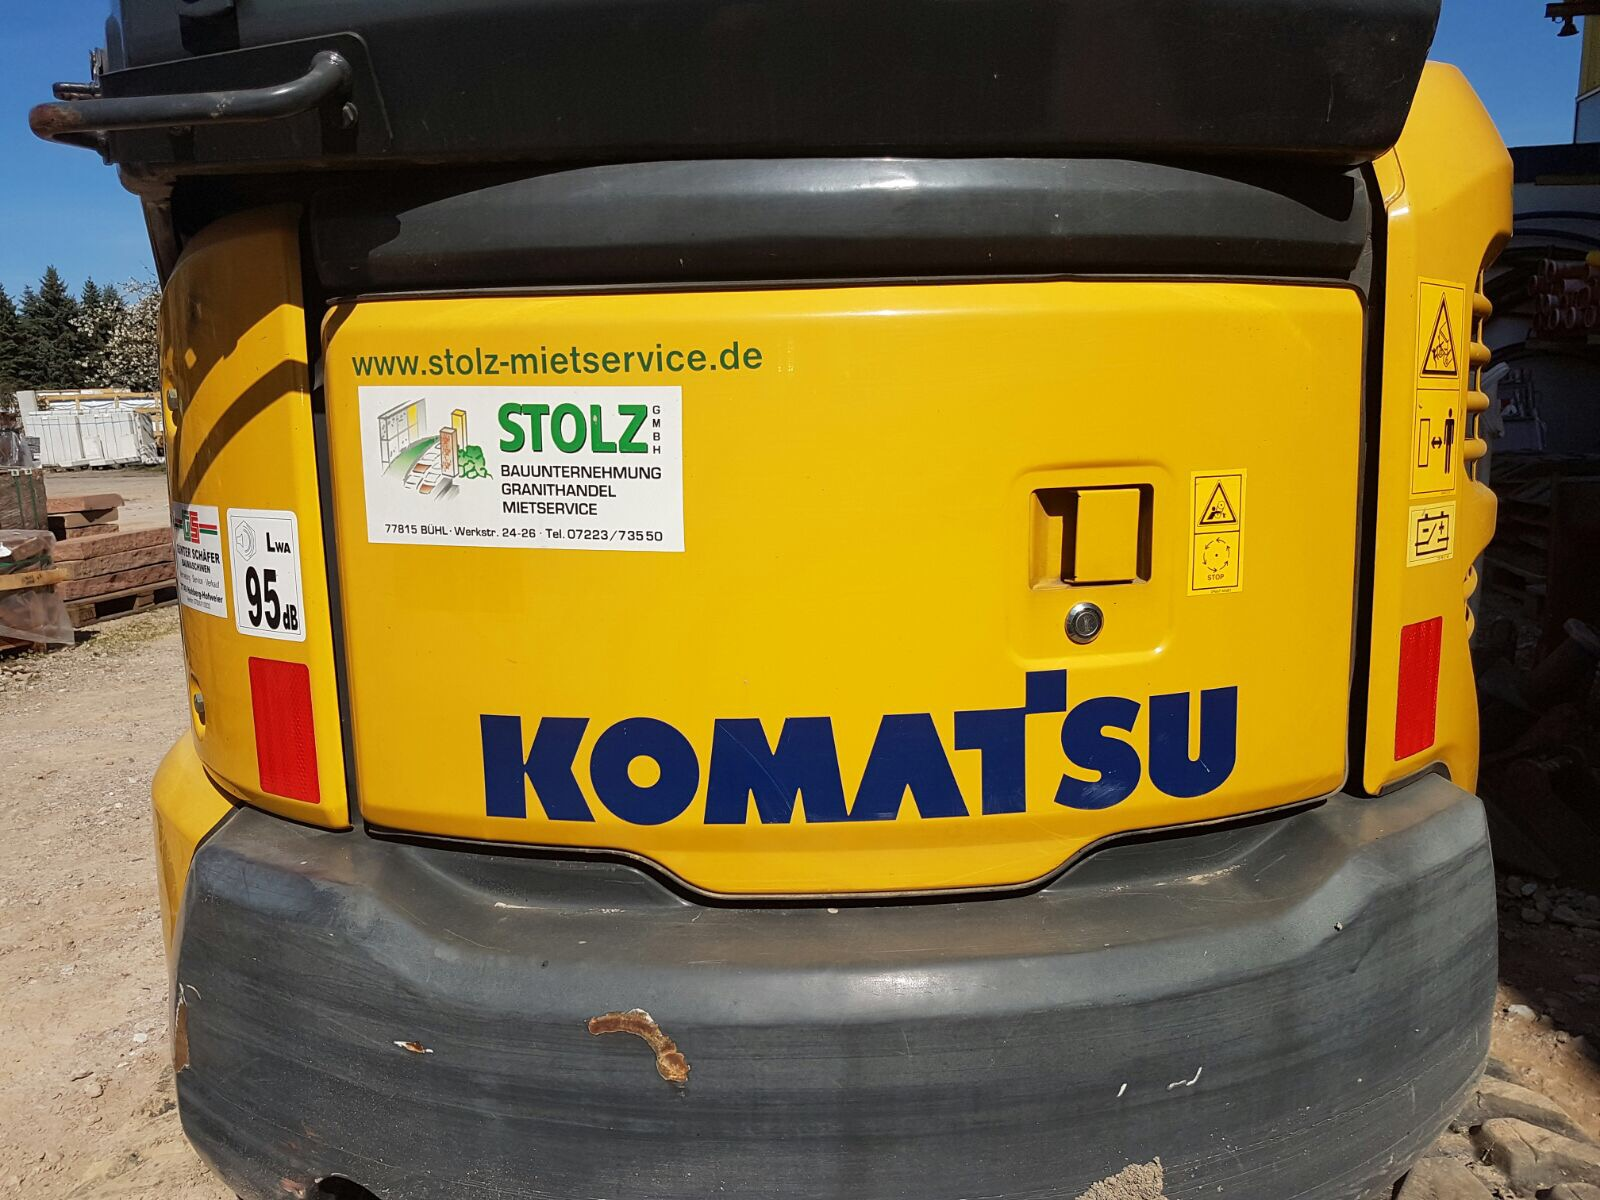 Komatsu Minibagger - Stolz GmbH Bauunternehmung Bühl/Baden- Mietservice